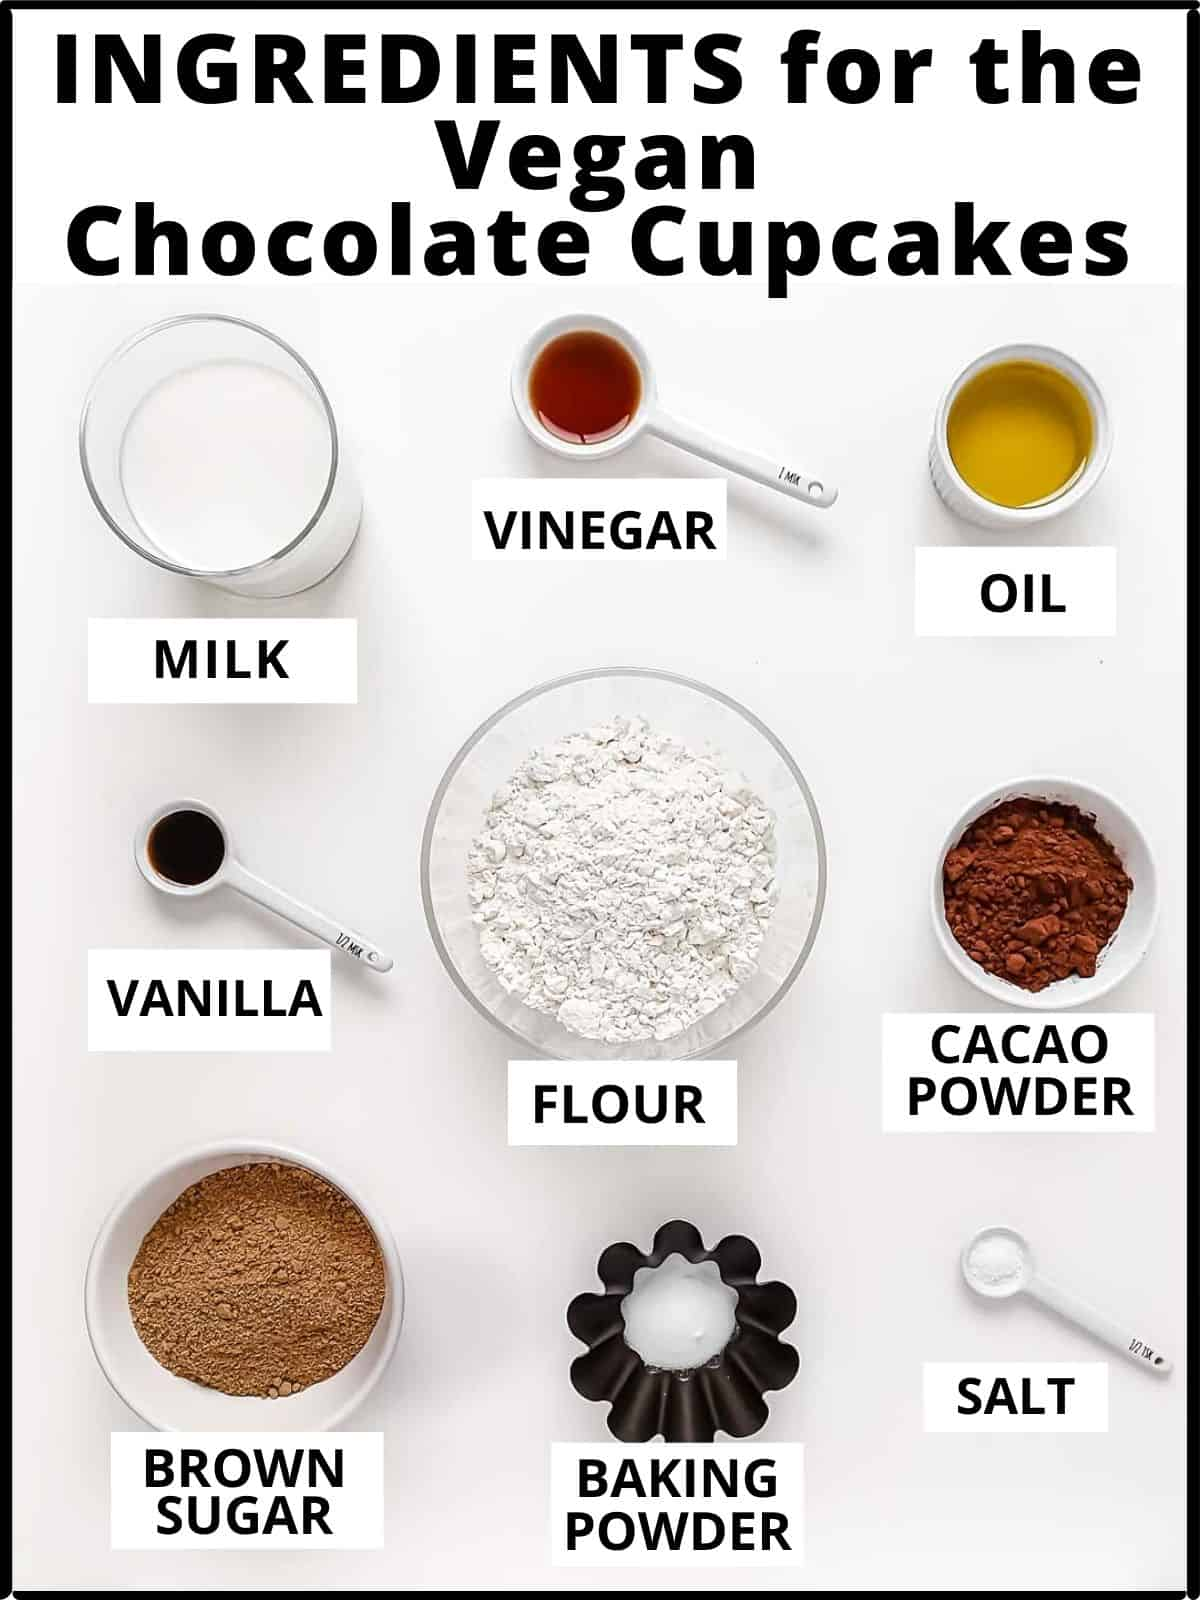 Ingredients for the cupcakes: milk, vinegar, oil, vanilla, flour, cacao powder, sugar, baking powder, salt.